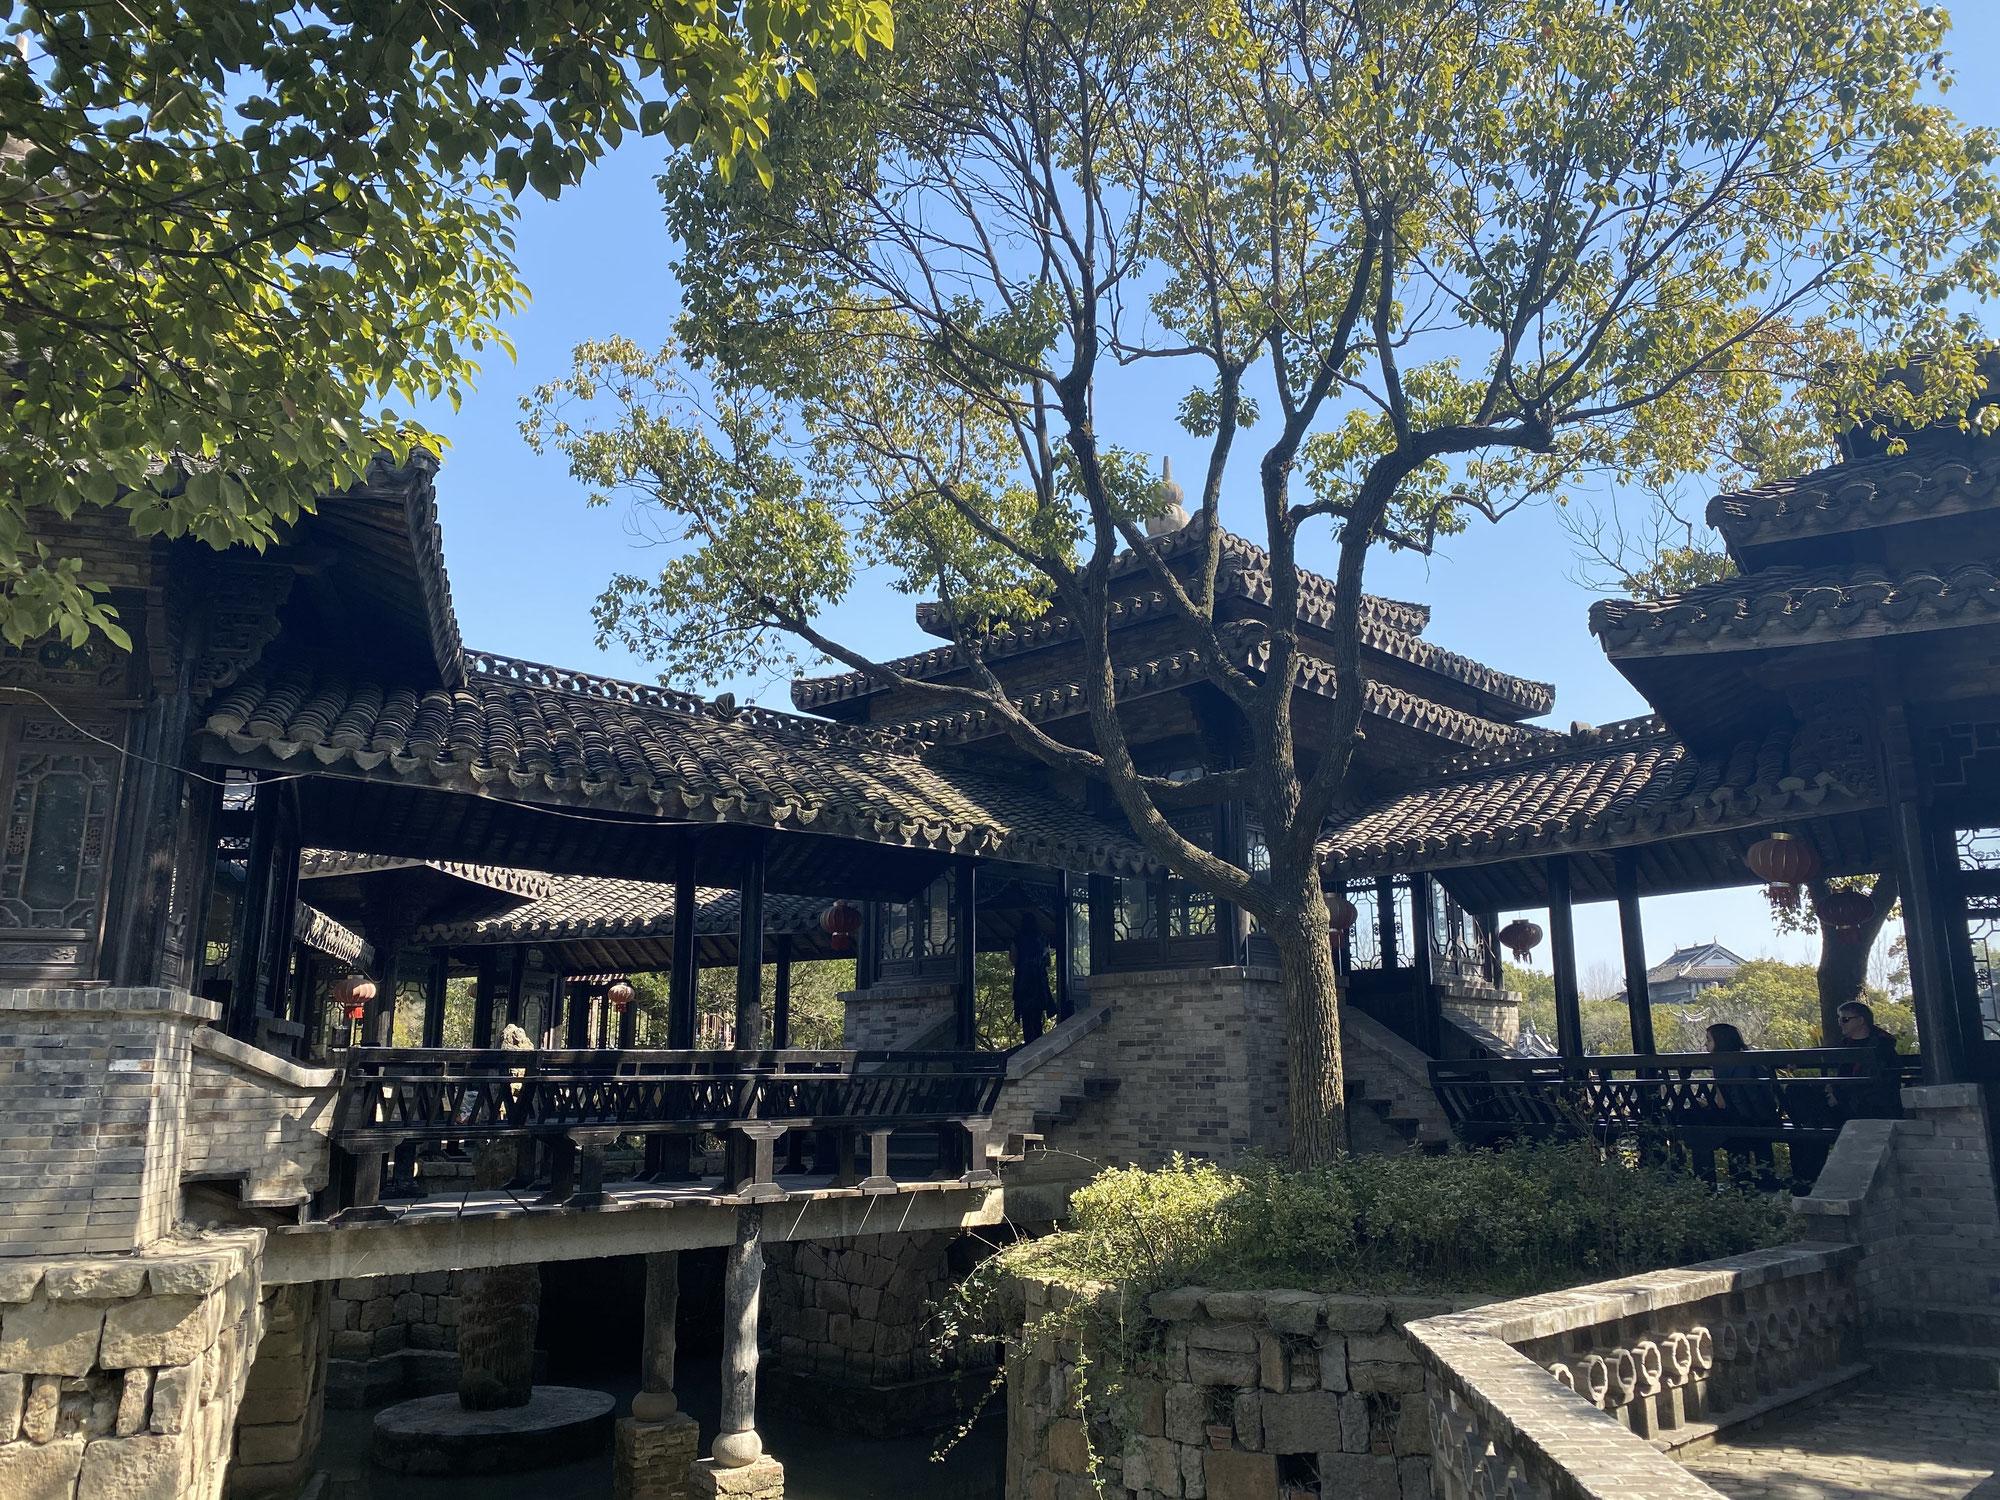 Hanxiang Water Expo Park